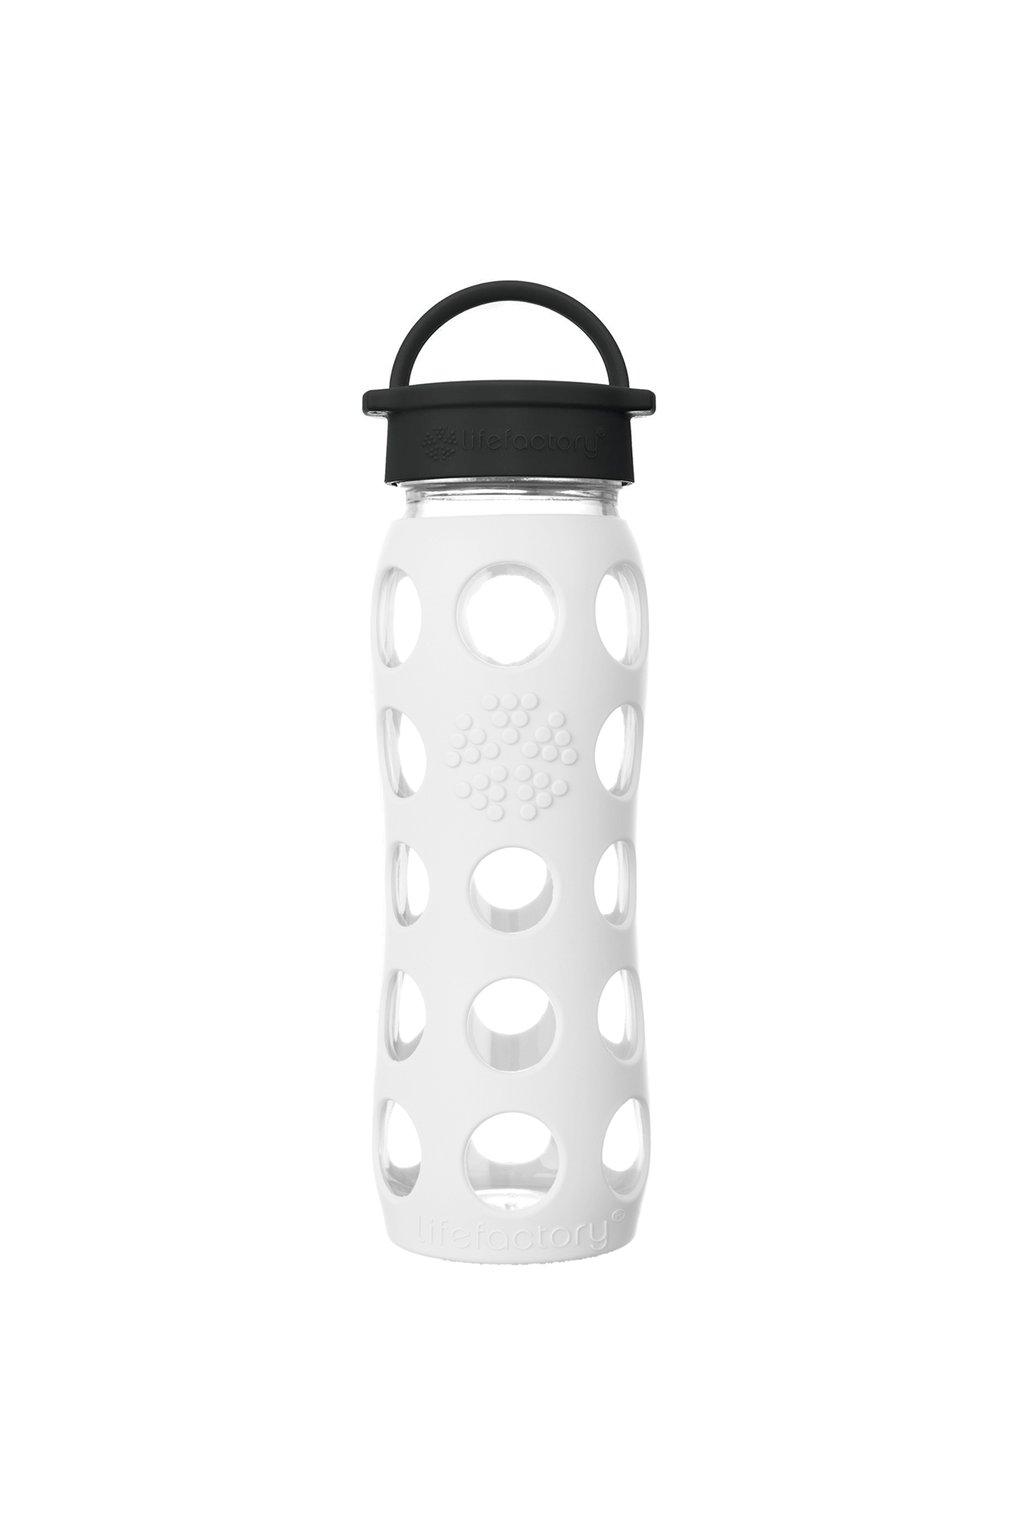 Sklenená fľaša na smoothie Lifefactory 650 ml Optic white